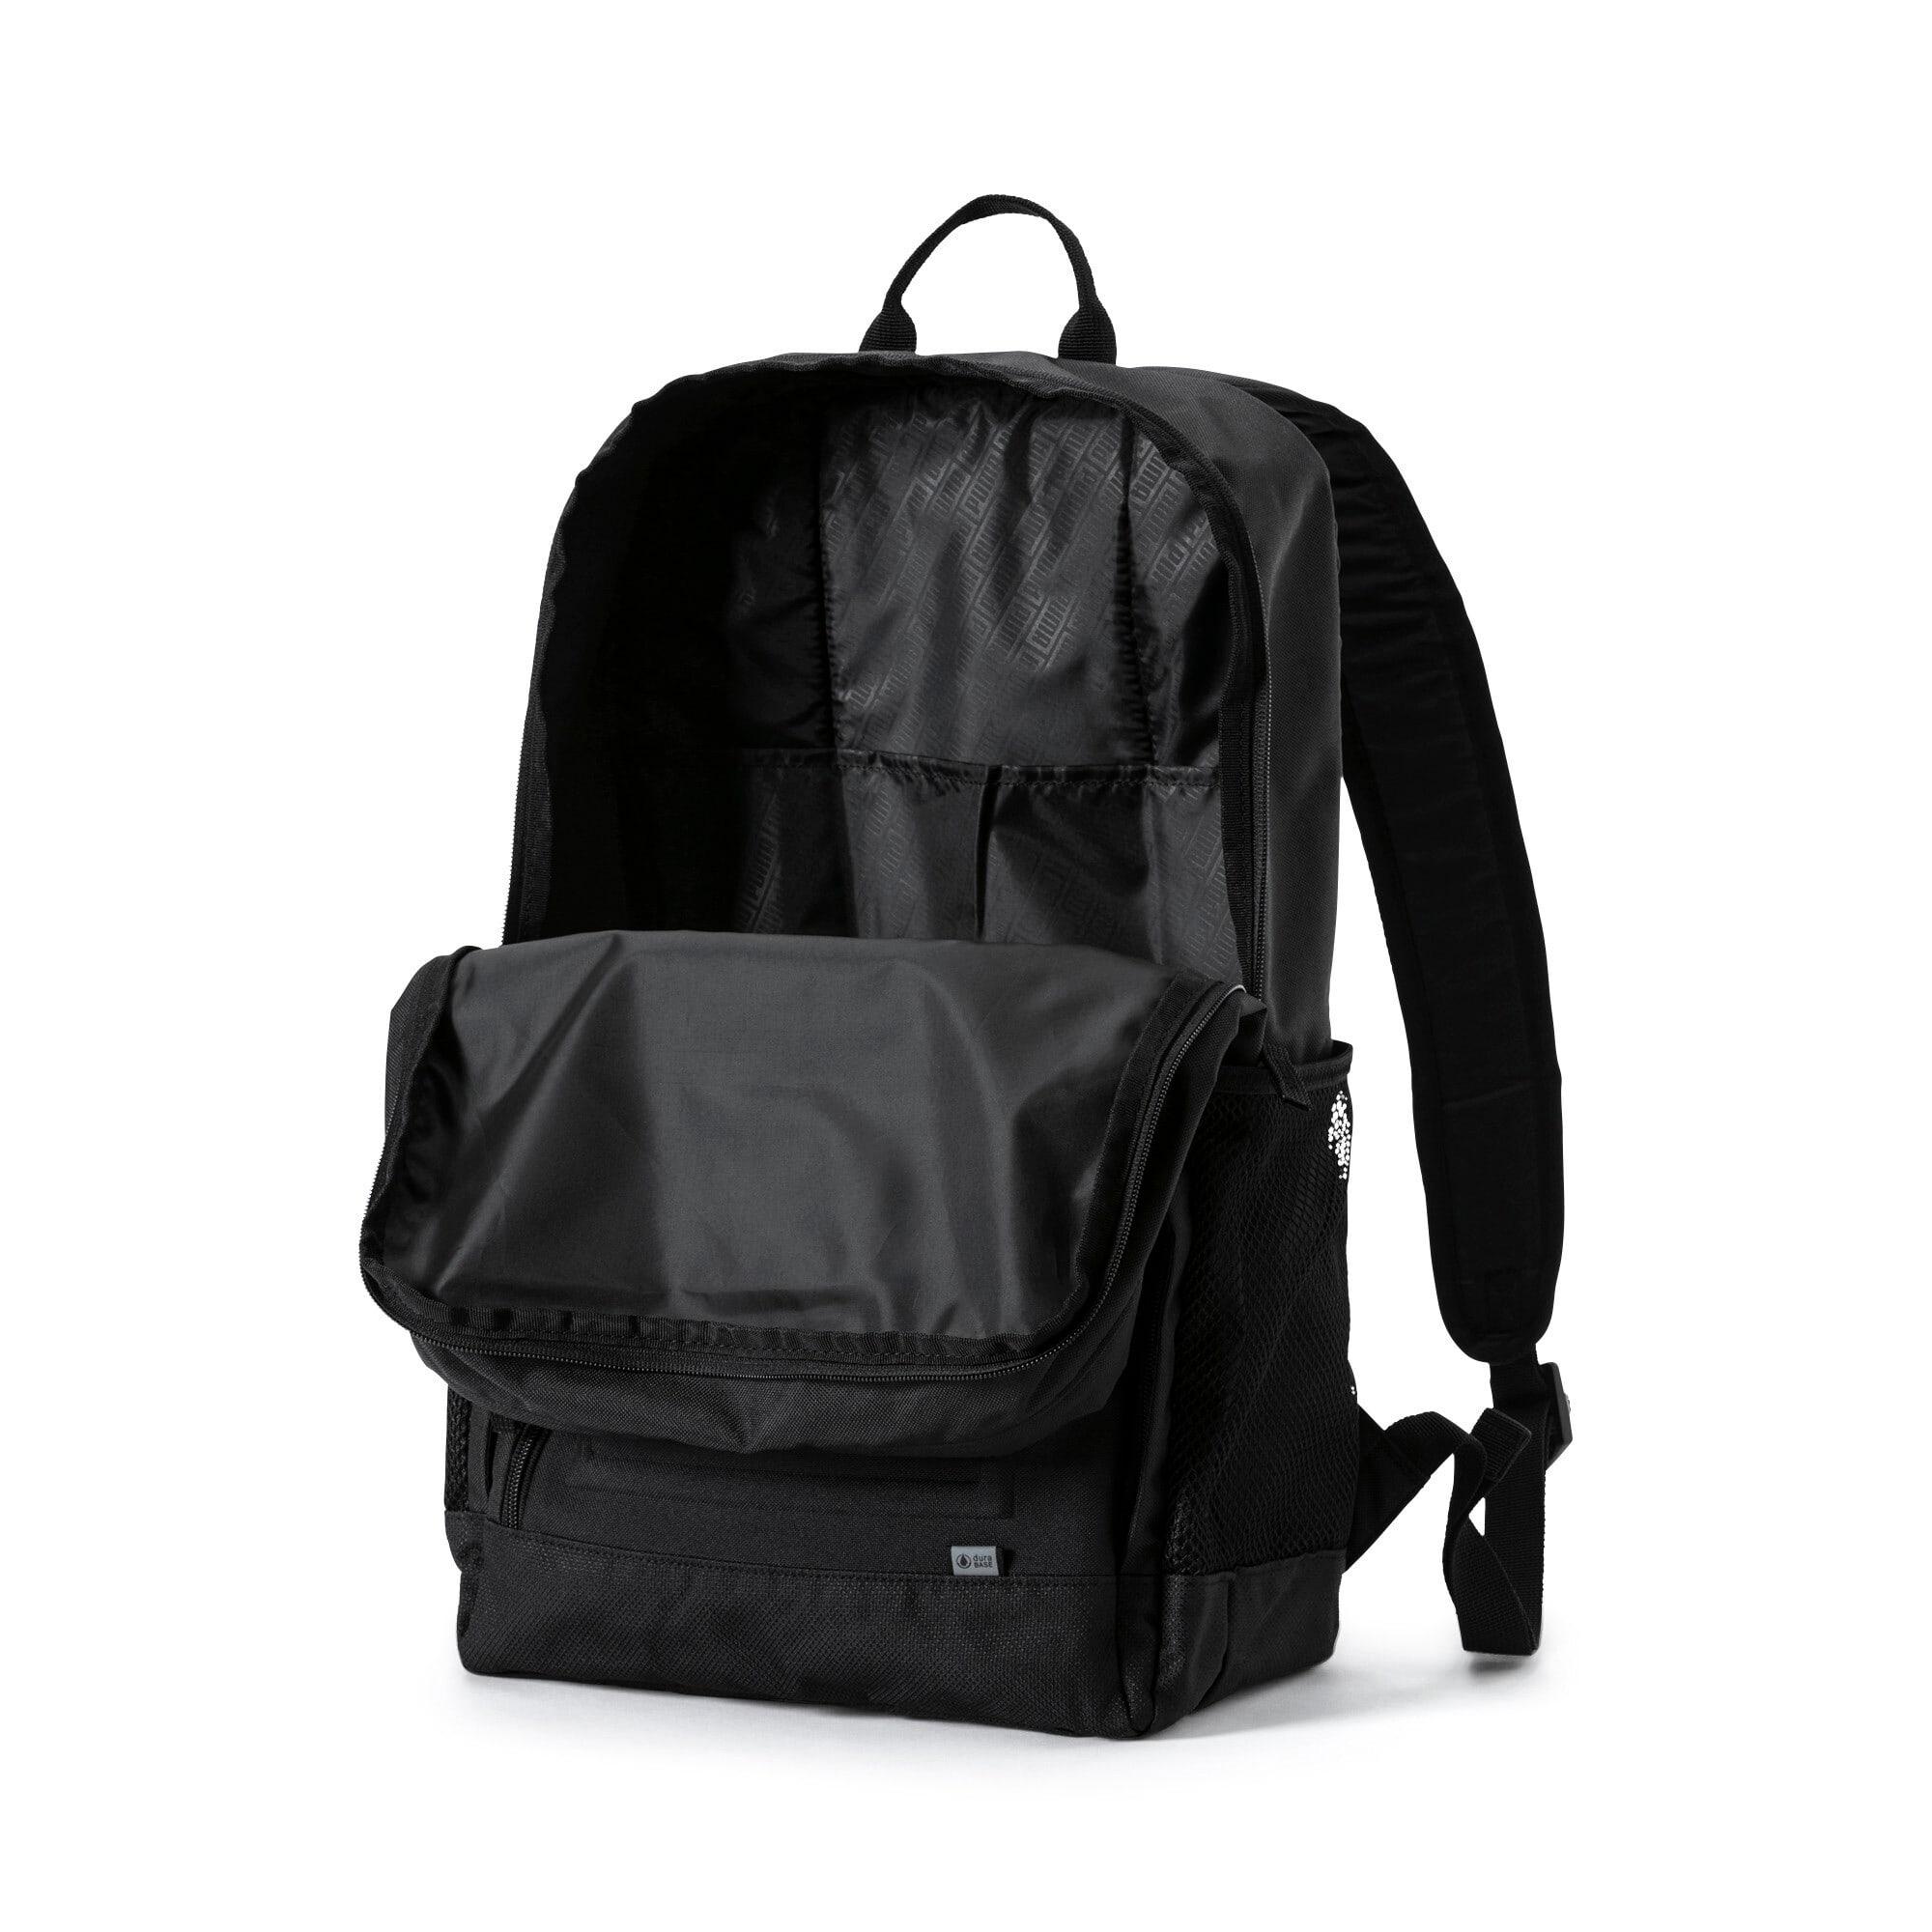 Thumbnail 3 of Square Backpack, Puma Black, medium